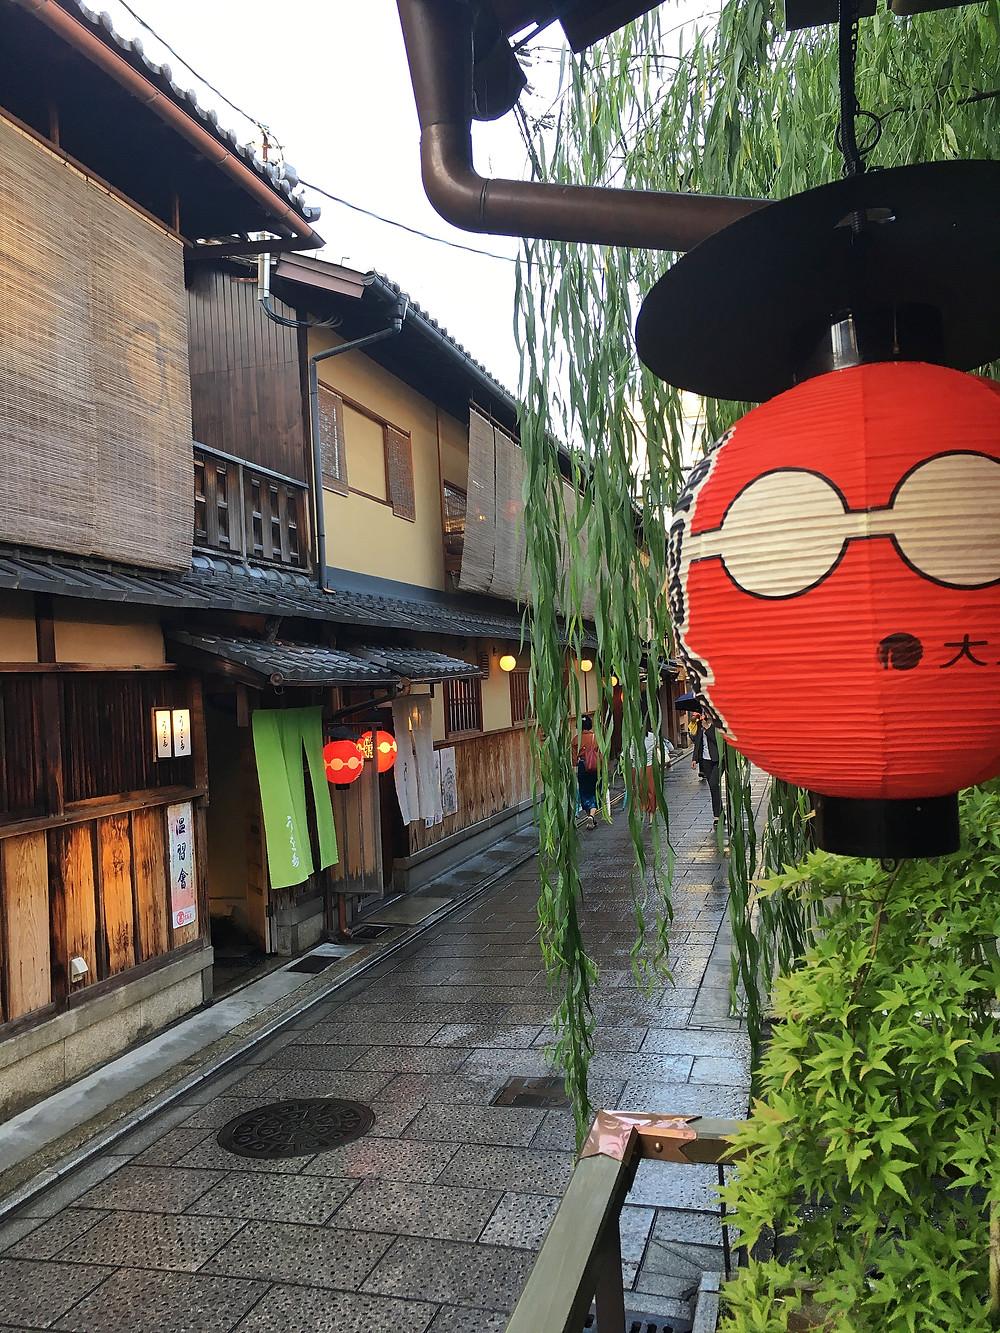 Street in Gion, Kyoto Japan